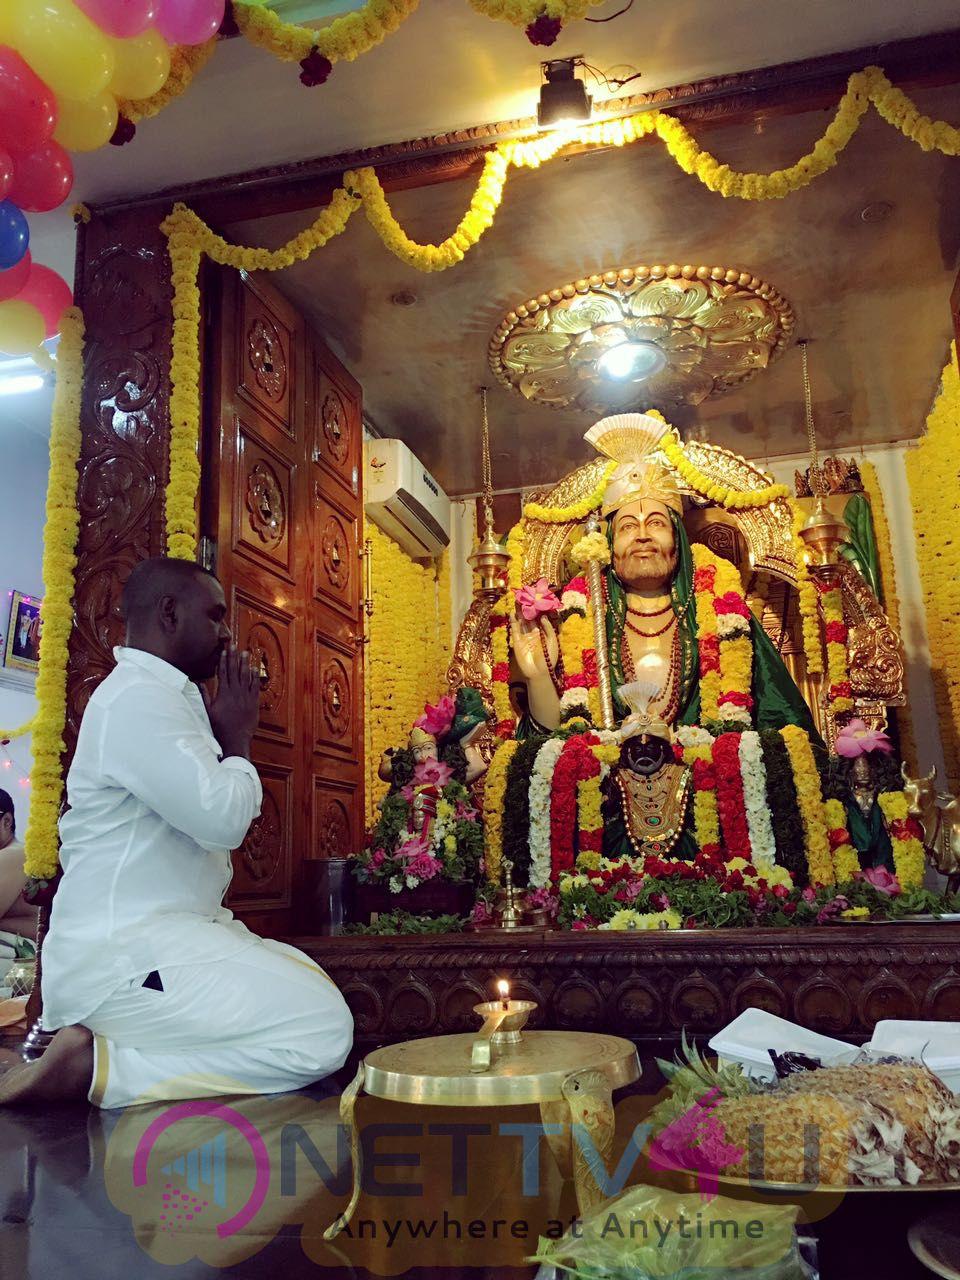 Raghava Lawrence Pray For Raghavendra Swamy Brindavanam Temple Photos